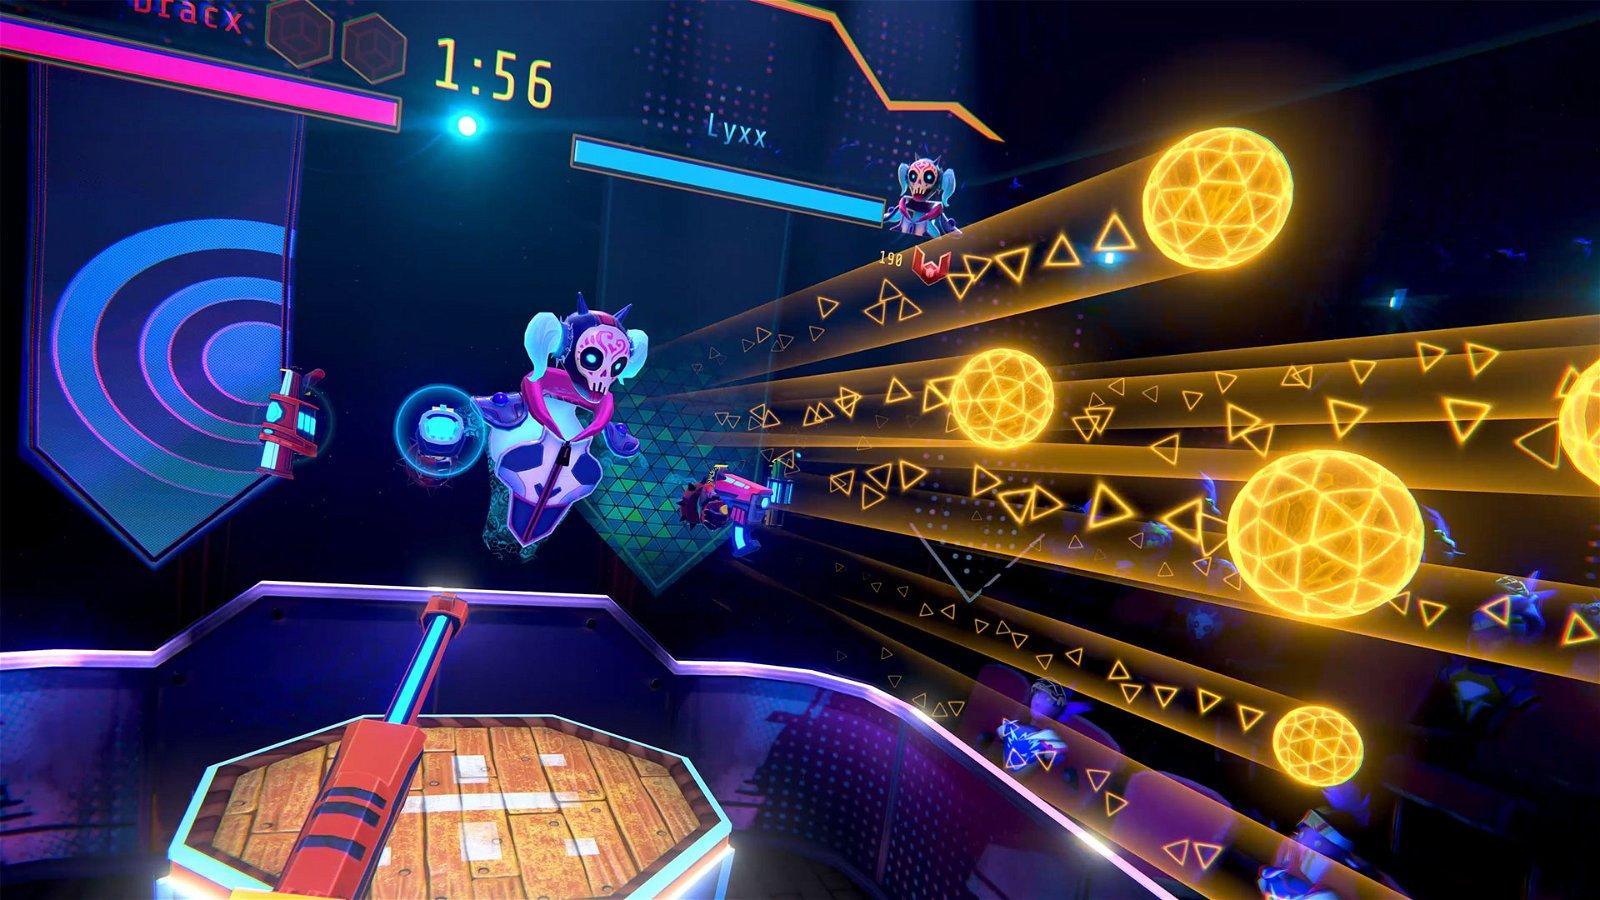 VR Studio Resolution Games Sees 500% Revenue Since Quest 2